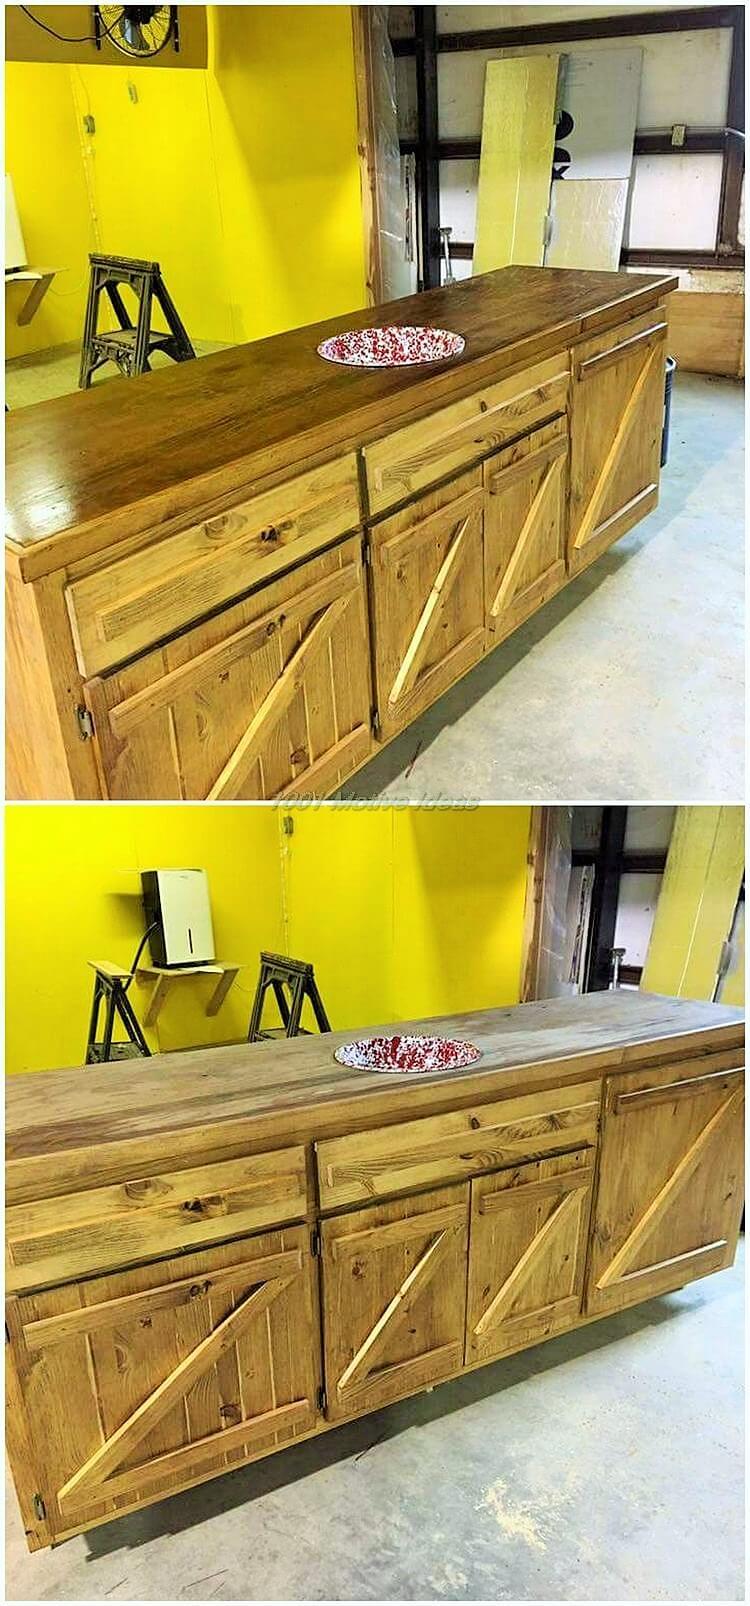 wooden-Pallet-Kitchen-furniture-Project-Ideas-004